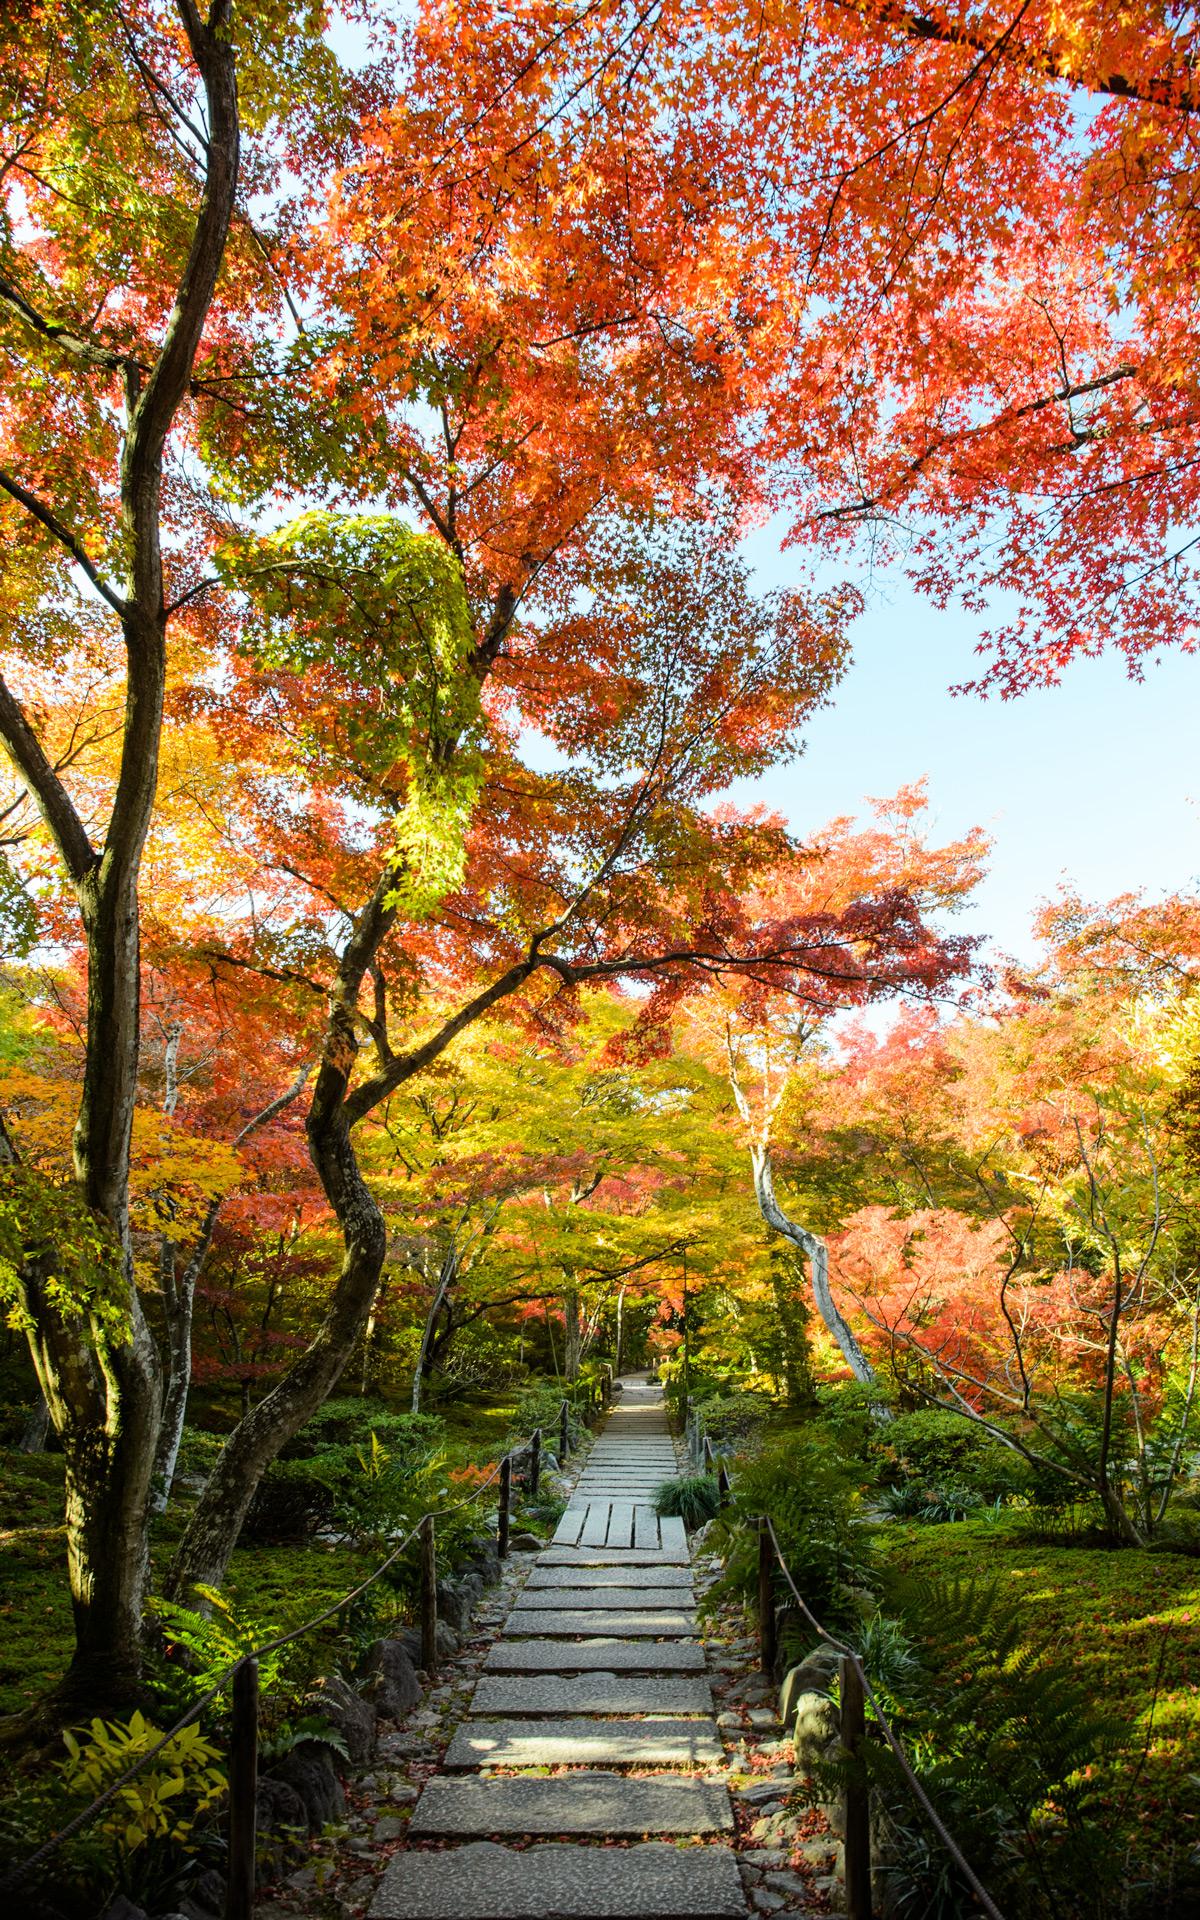 Fall Leaves Desktop Wallpaper Backgrounds Jeffrey Friedl S Blog 187 Fall Foliage At Kyoto Arashiyama S